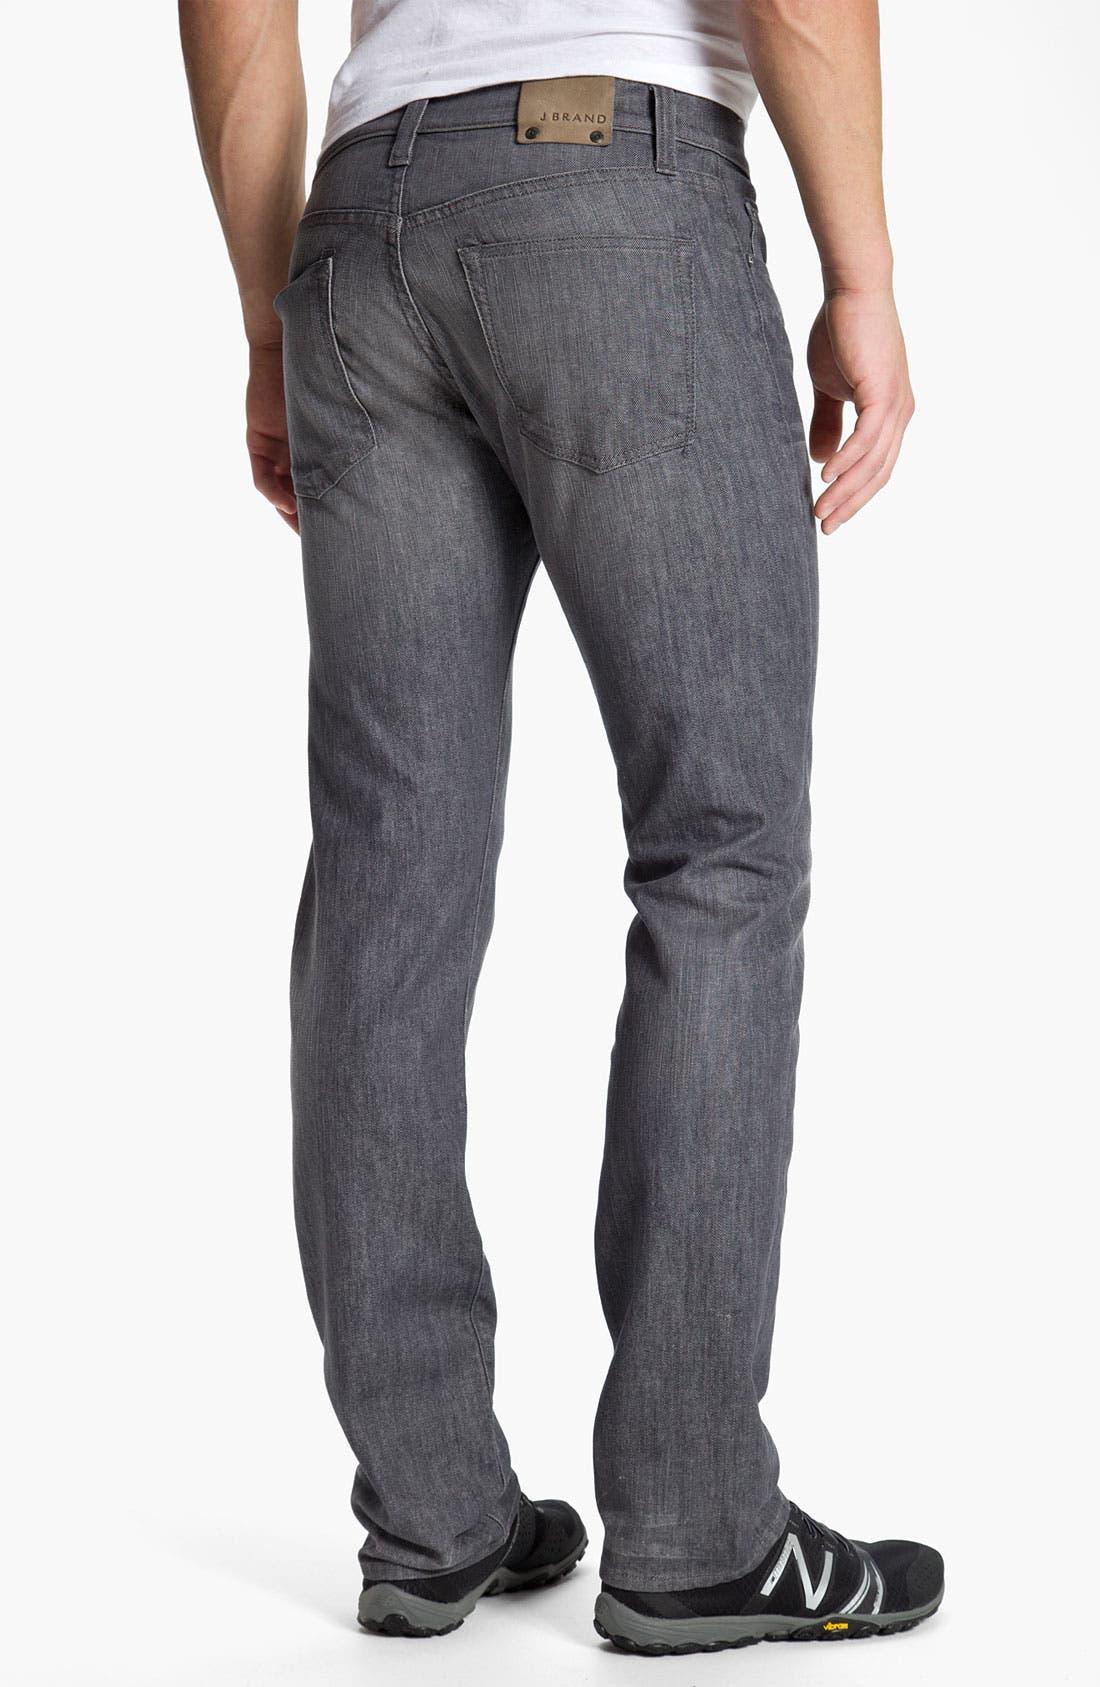 Main Image - J Brand 'Kane' Slim Fit Jeans (Ricochet) (Save Now through 12/9)